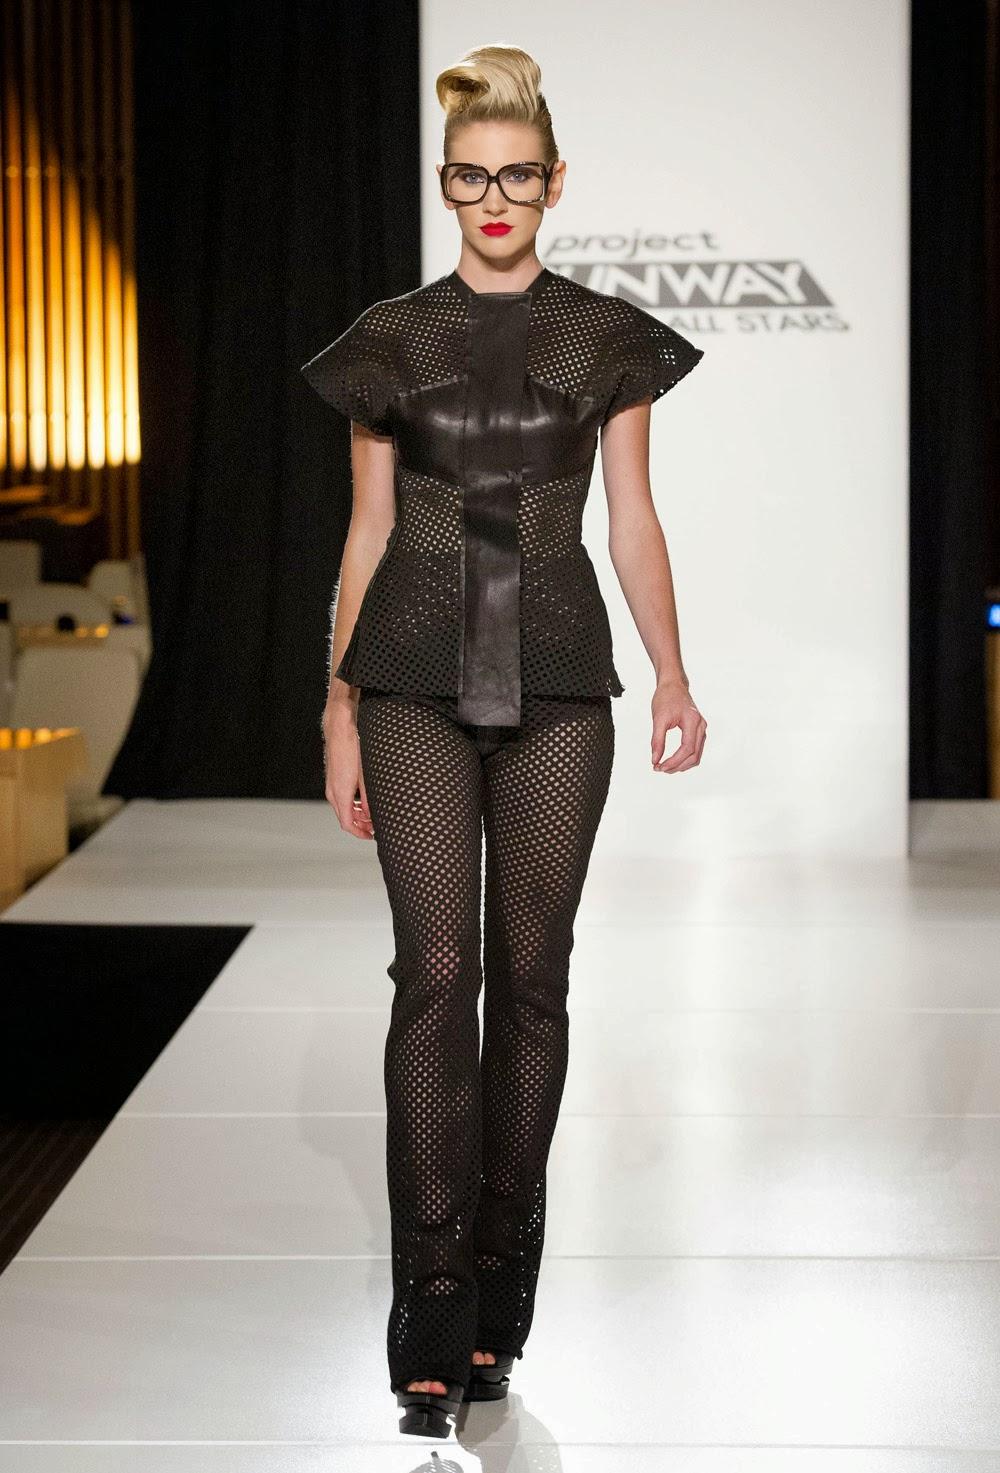 project-runway-all-star-winner-seth-aaron-fashionado